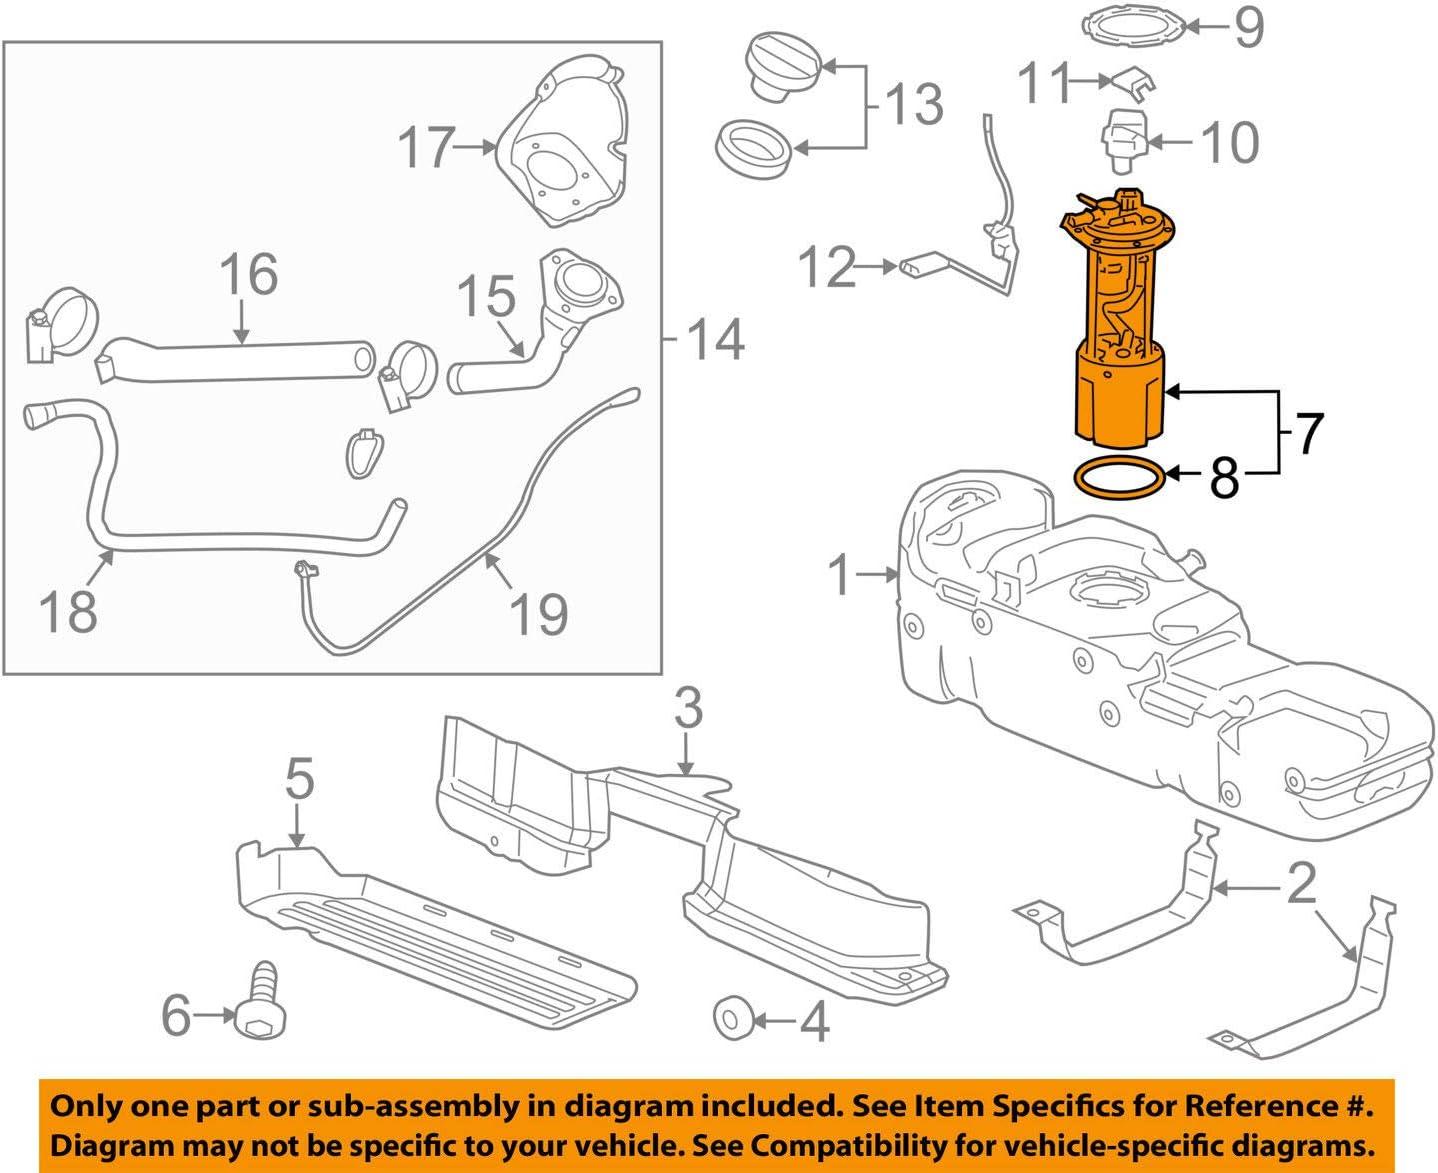 Amazon.com: General Motors 13589707, Electric Fuel Pump: AutomotiveAmazon.com